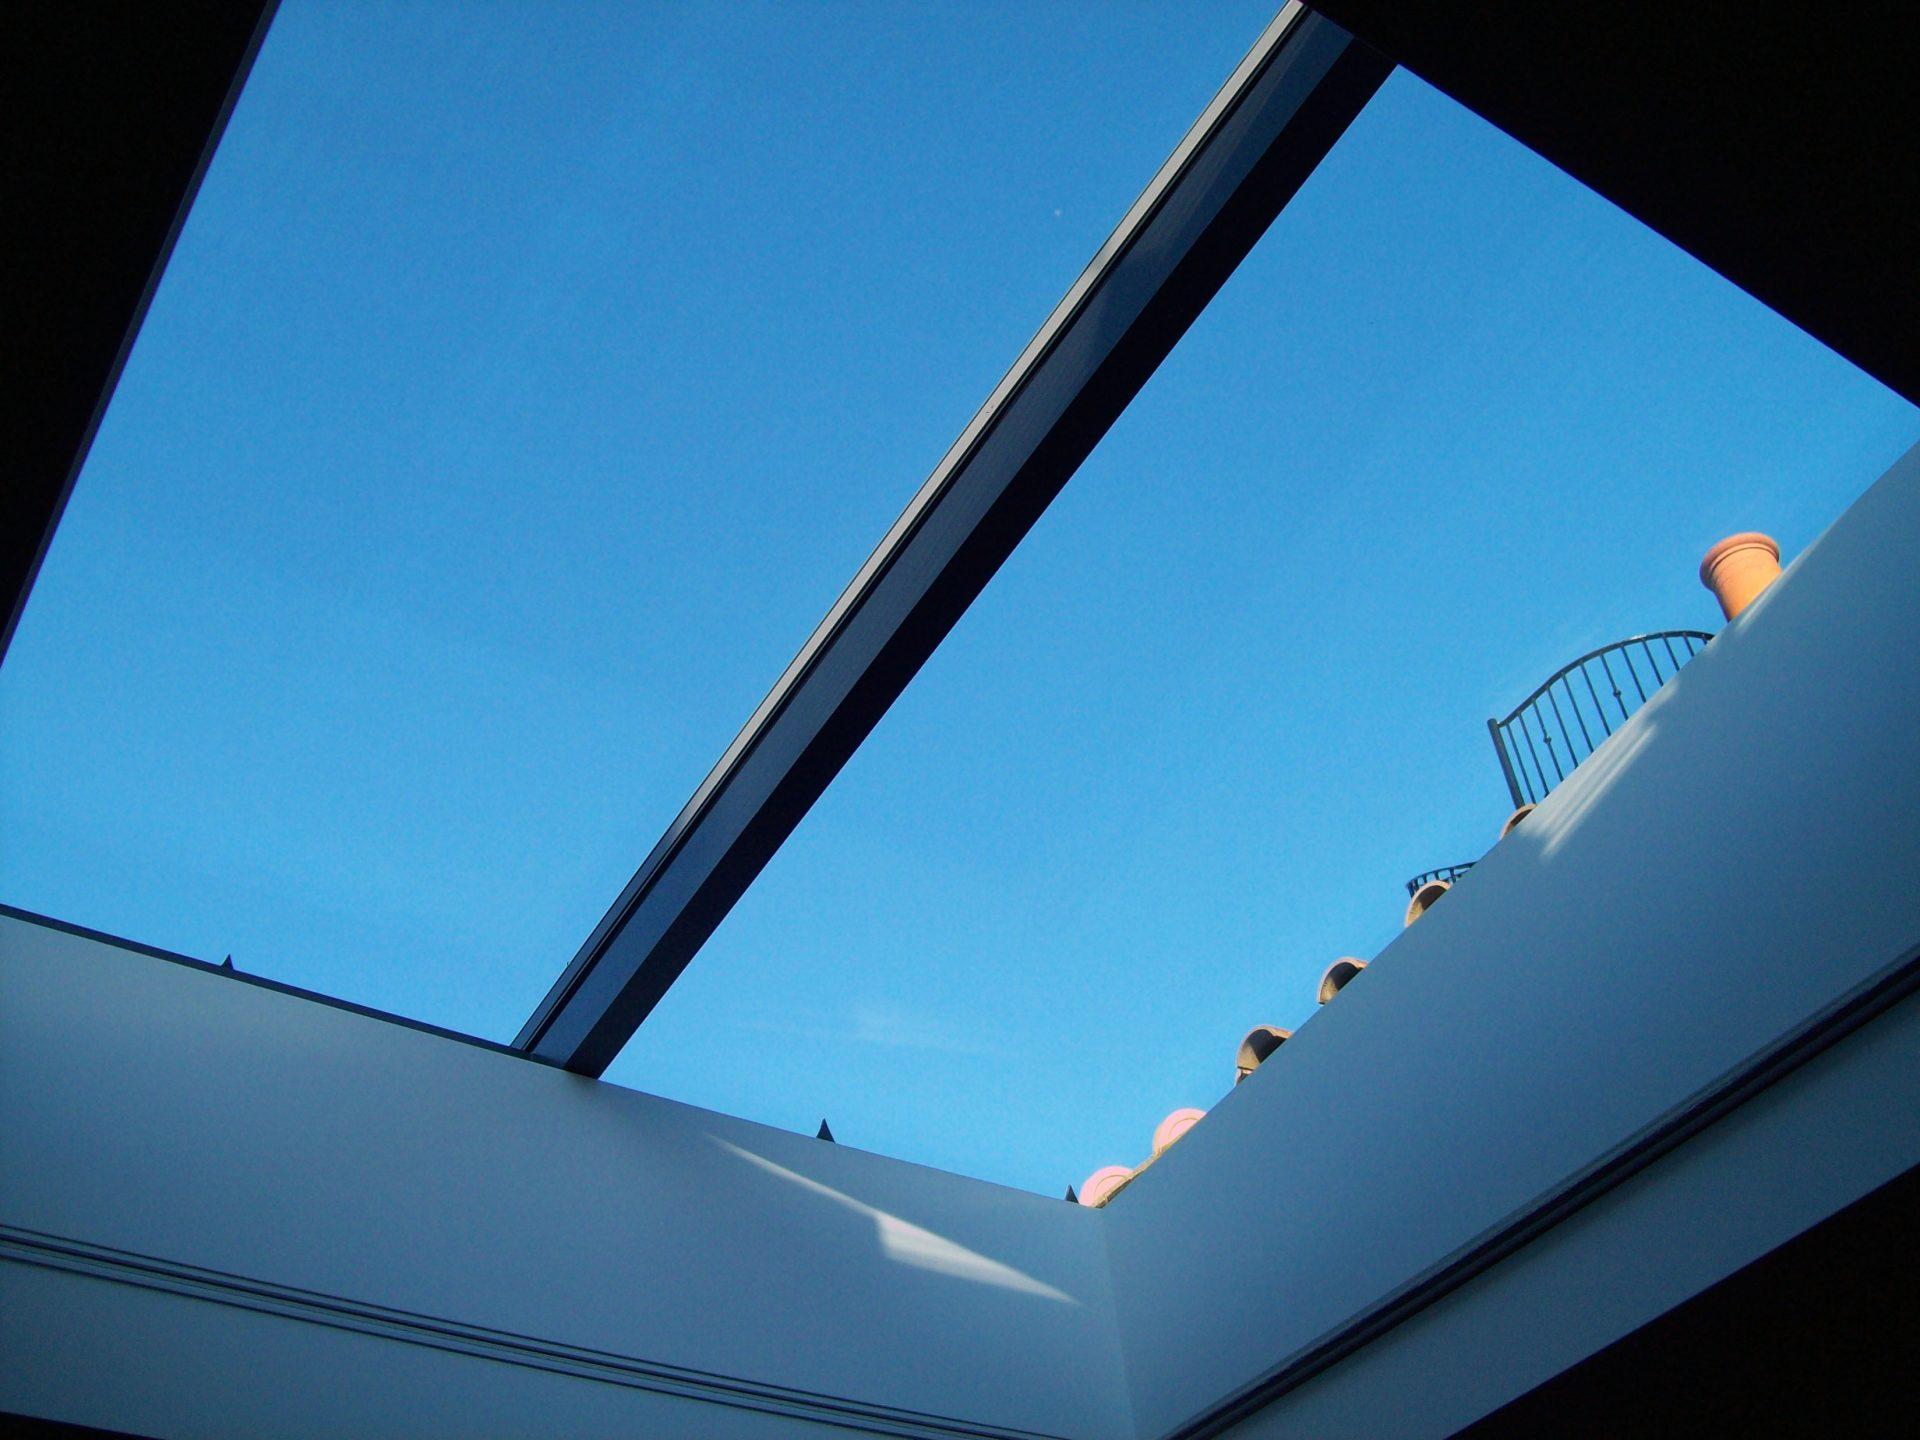 schiebedachfenster ber fest glazing vision europe. Black Bedroom Furniture Sets. Home Design Ideas